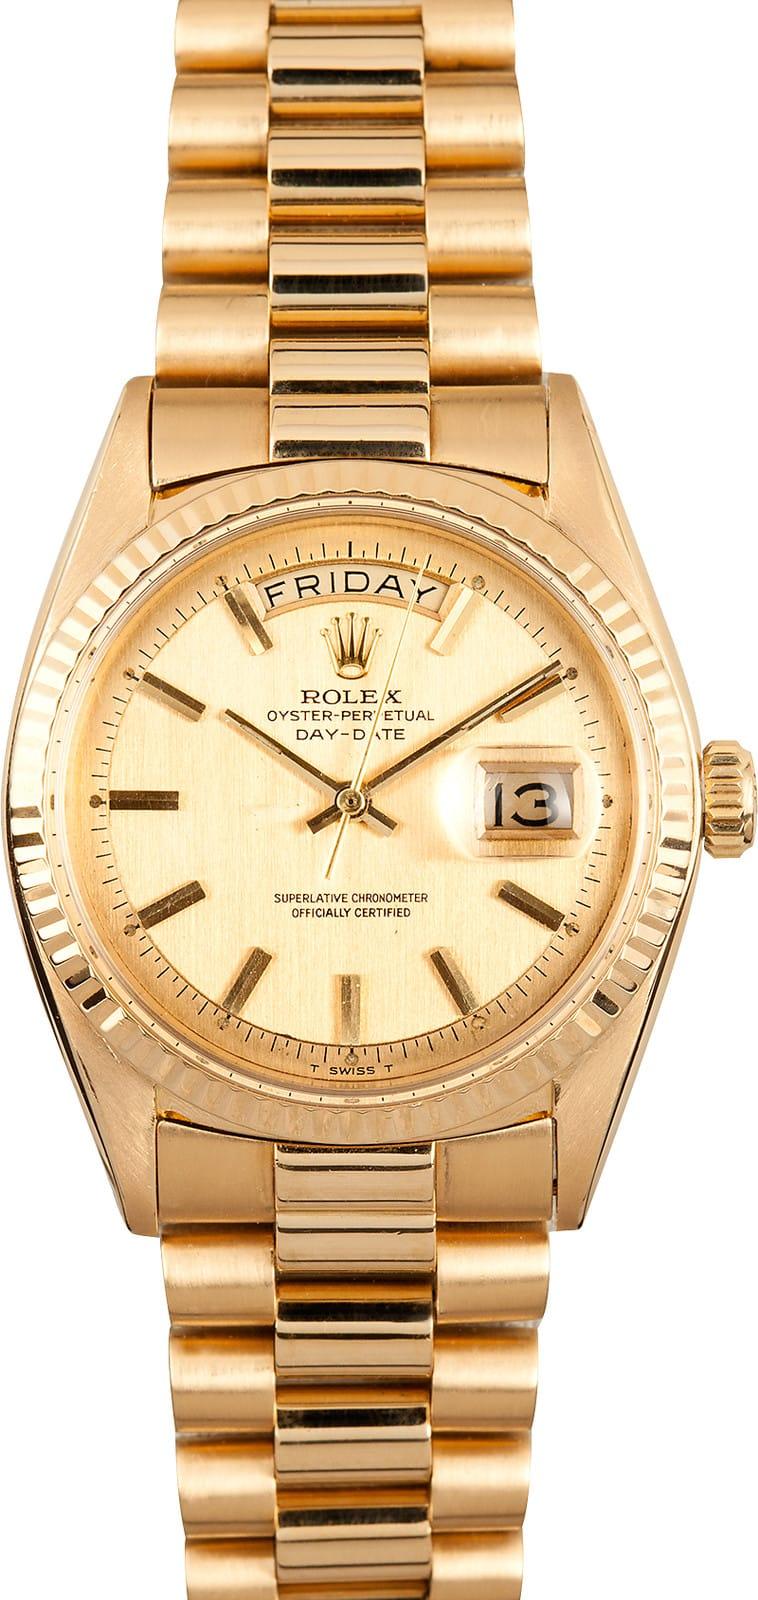 Used Rolex Submariner >> Mens Vintage Rolex Day Date 1803 - 100% Authentic Rolex